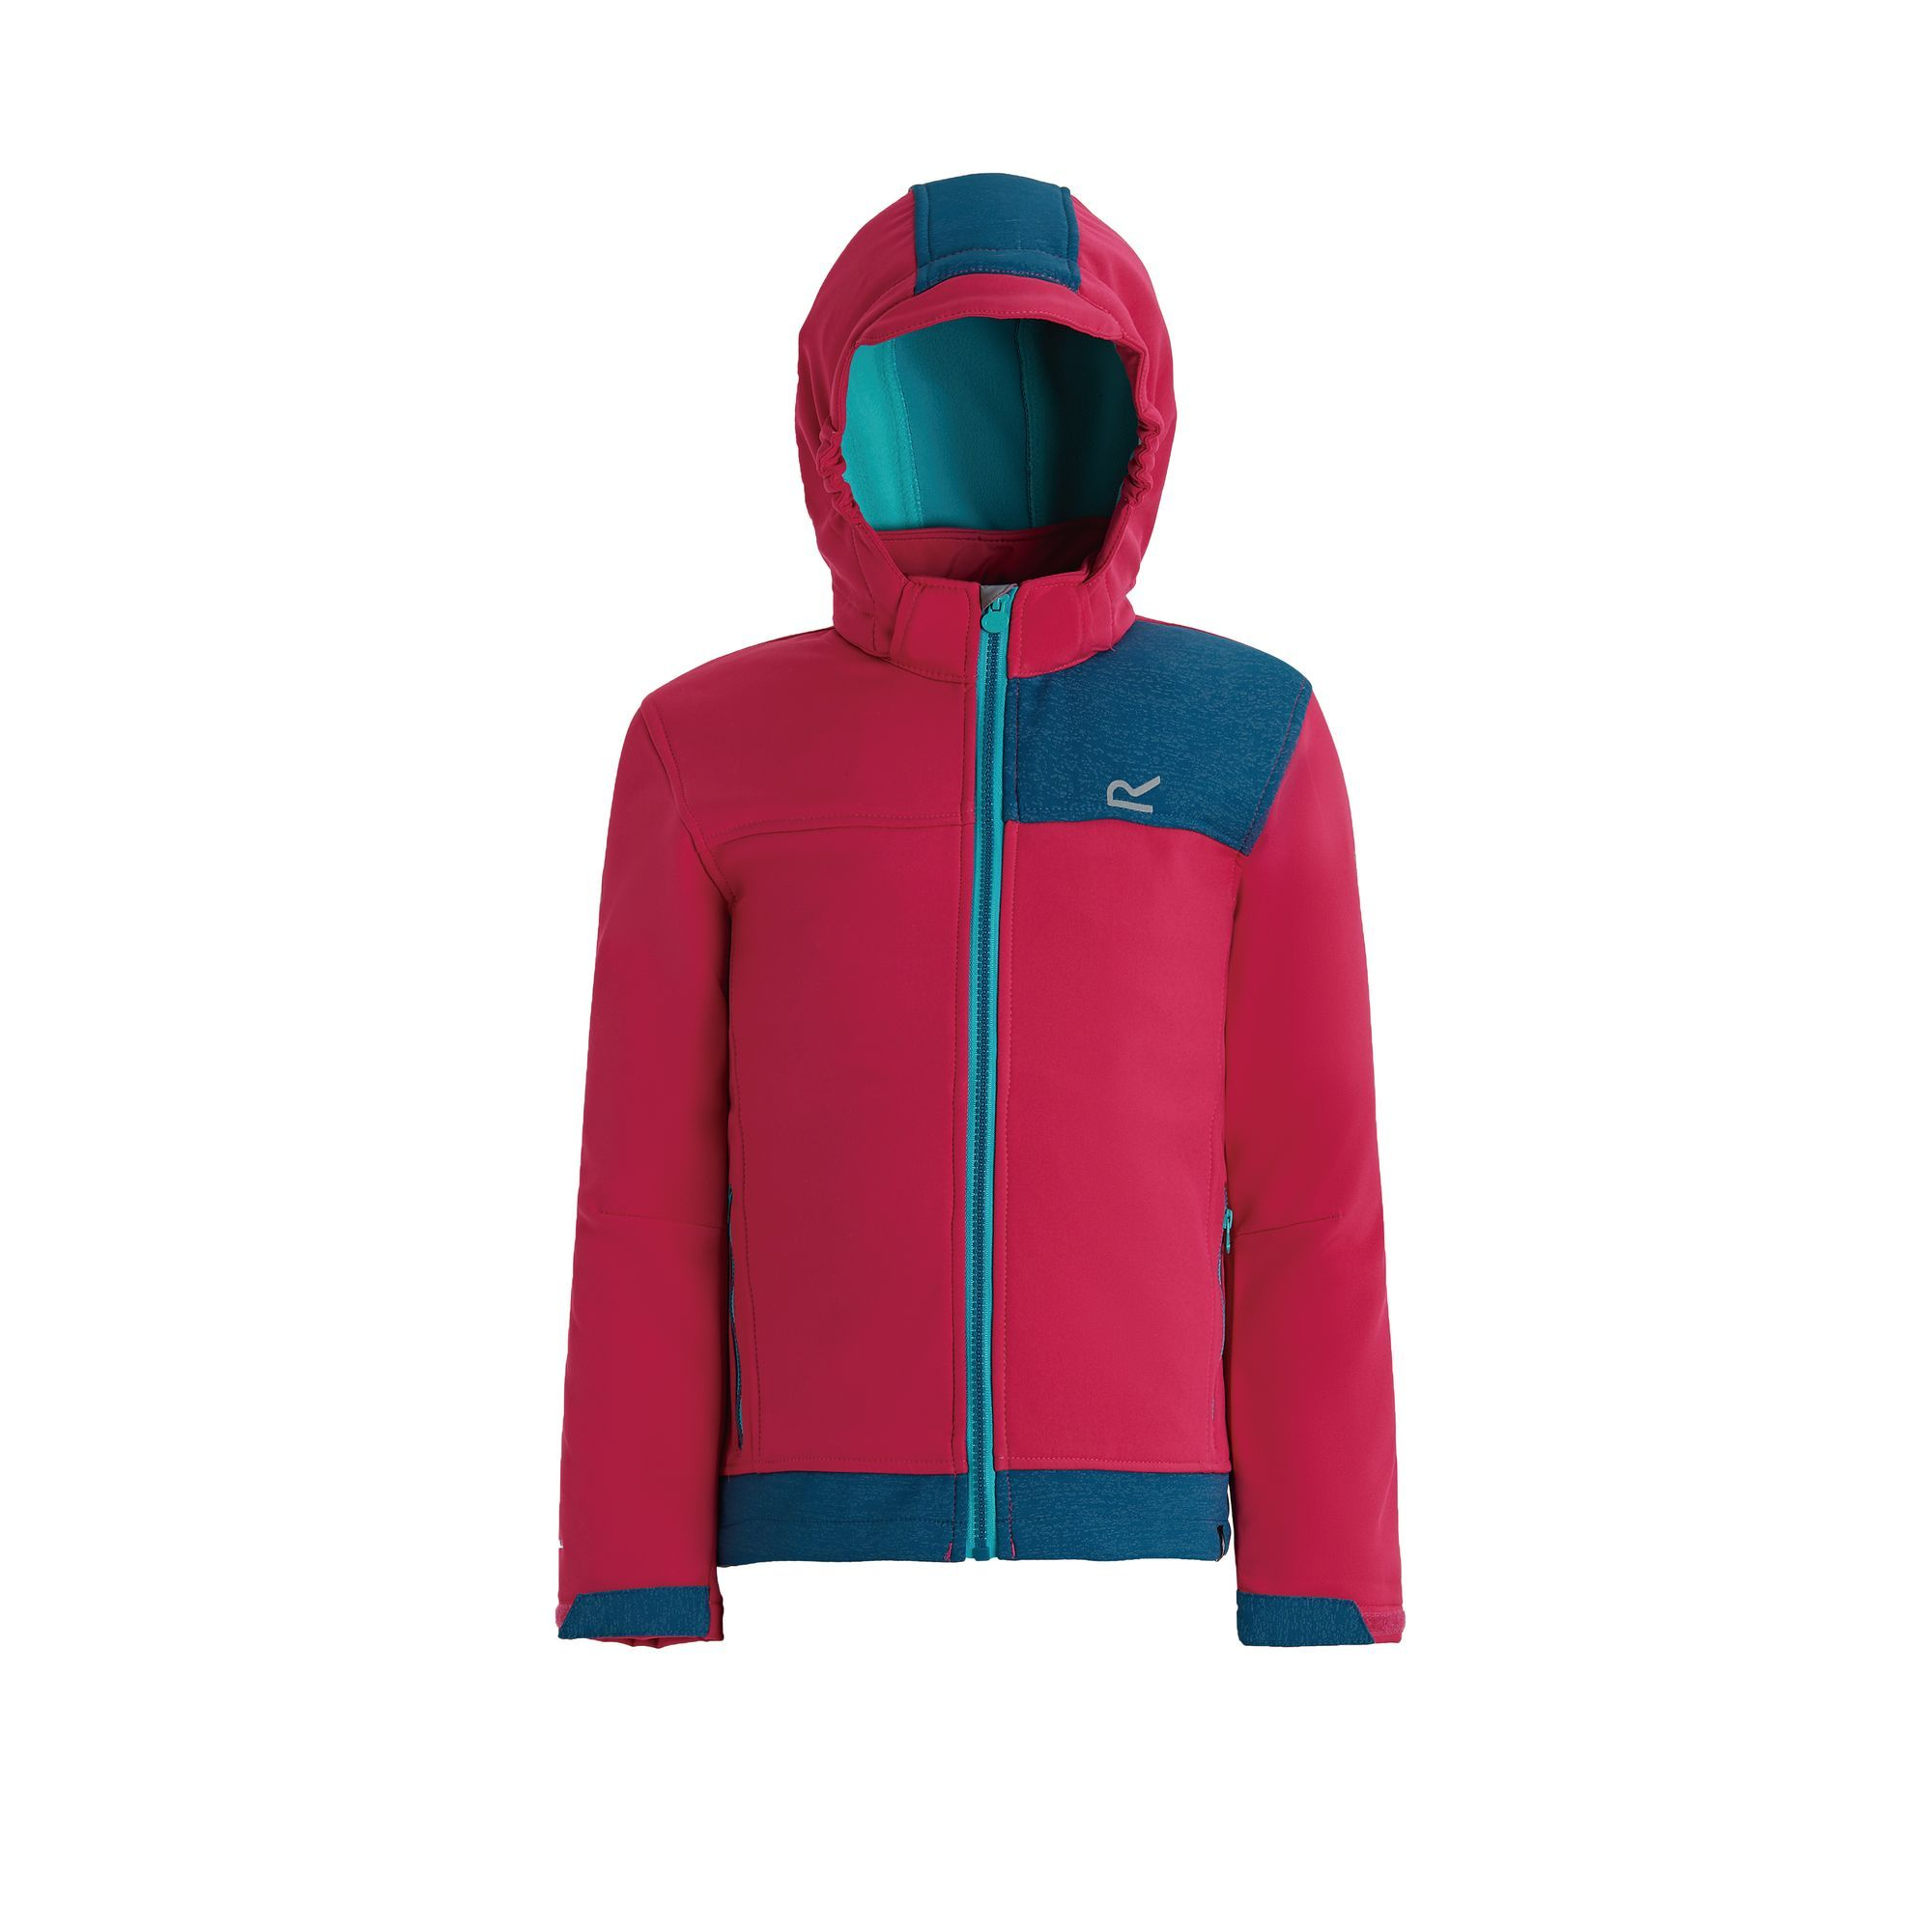 Dare2b Boys Girls Kids Exceed Core Stretch Midlayer Softshell Jacket RRP £35